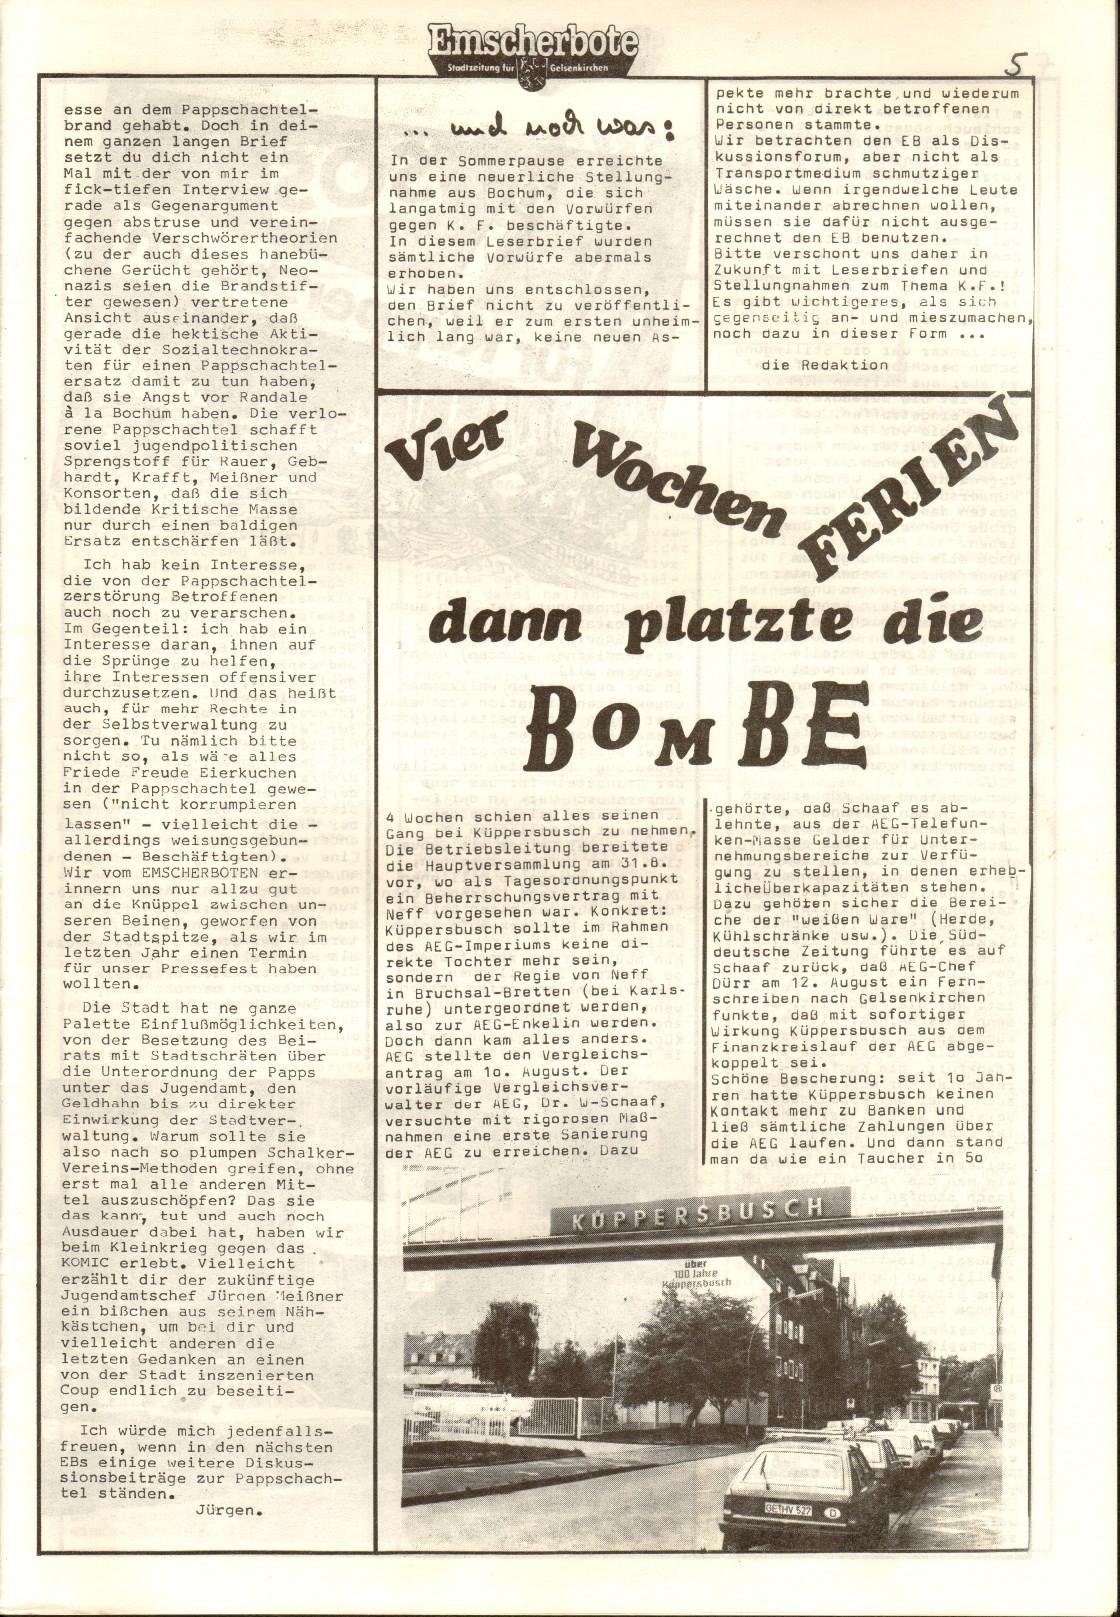 Gelsenkirchen_Emscherbote_1982_20_05